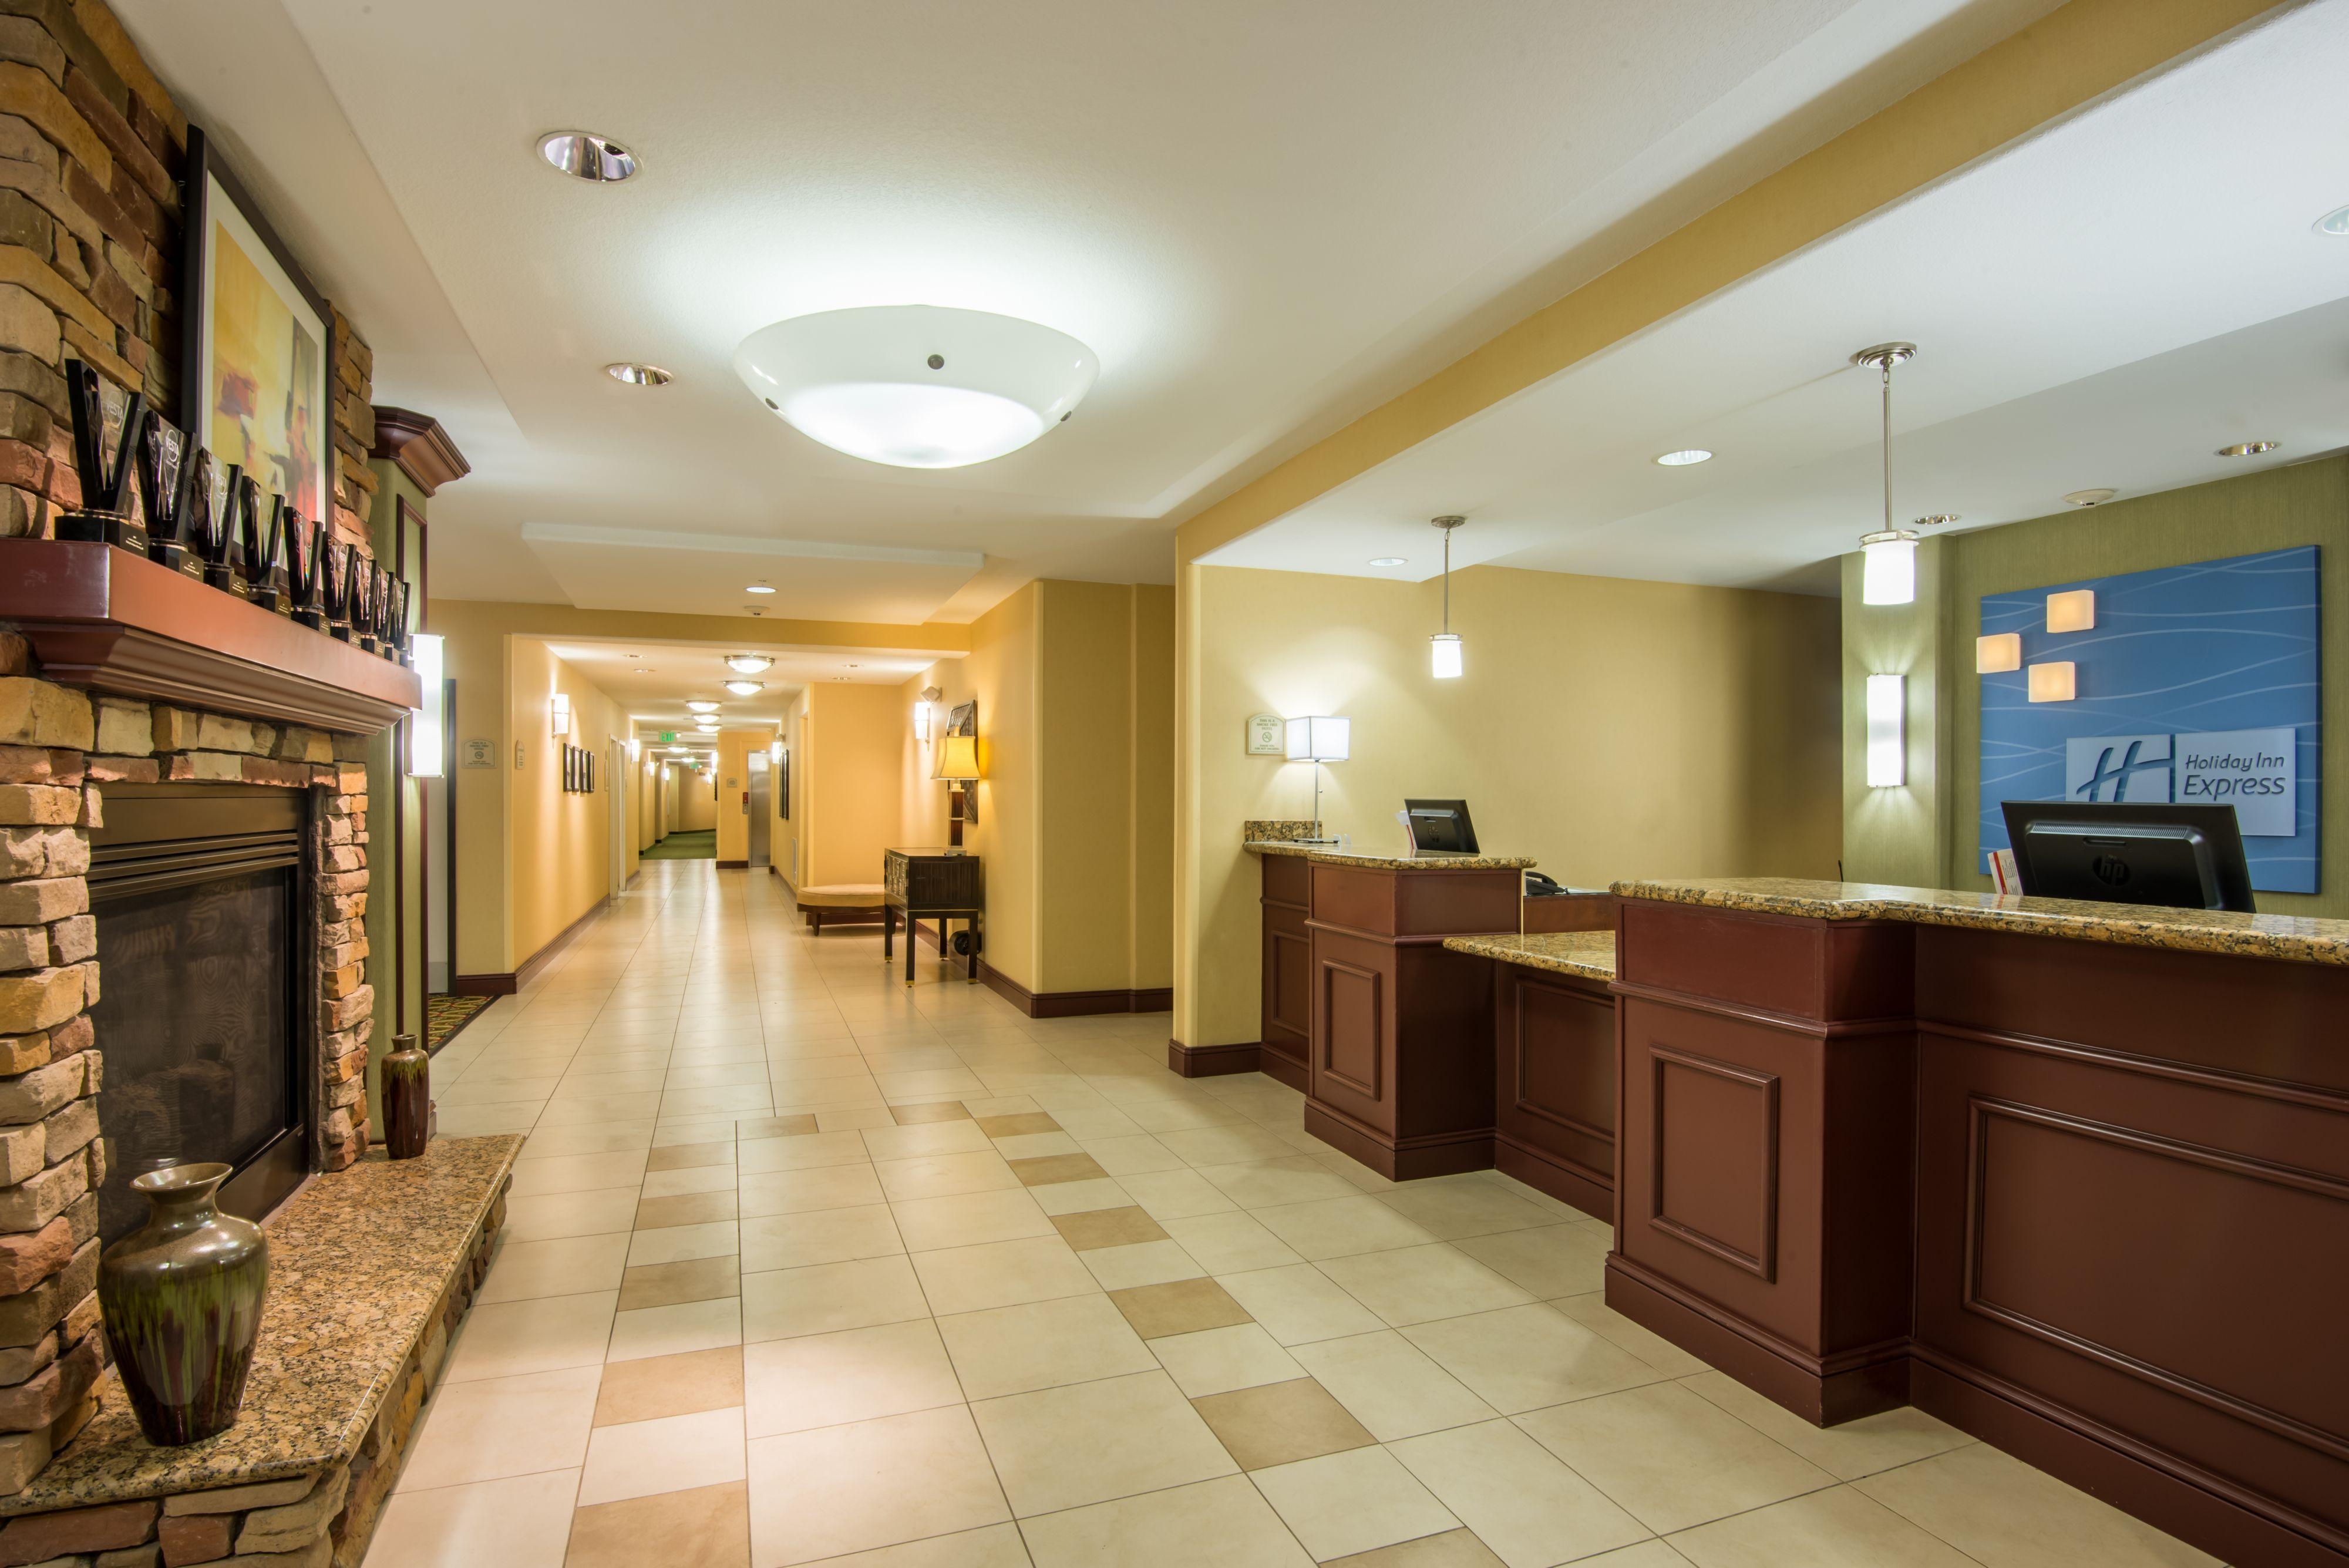 Holiday Inn Express & Suites Phoenix - Glendale Sports Dist image 4